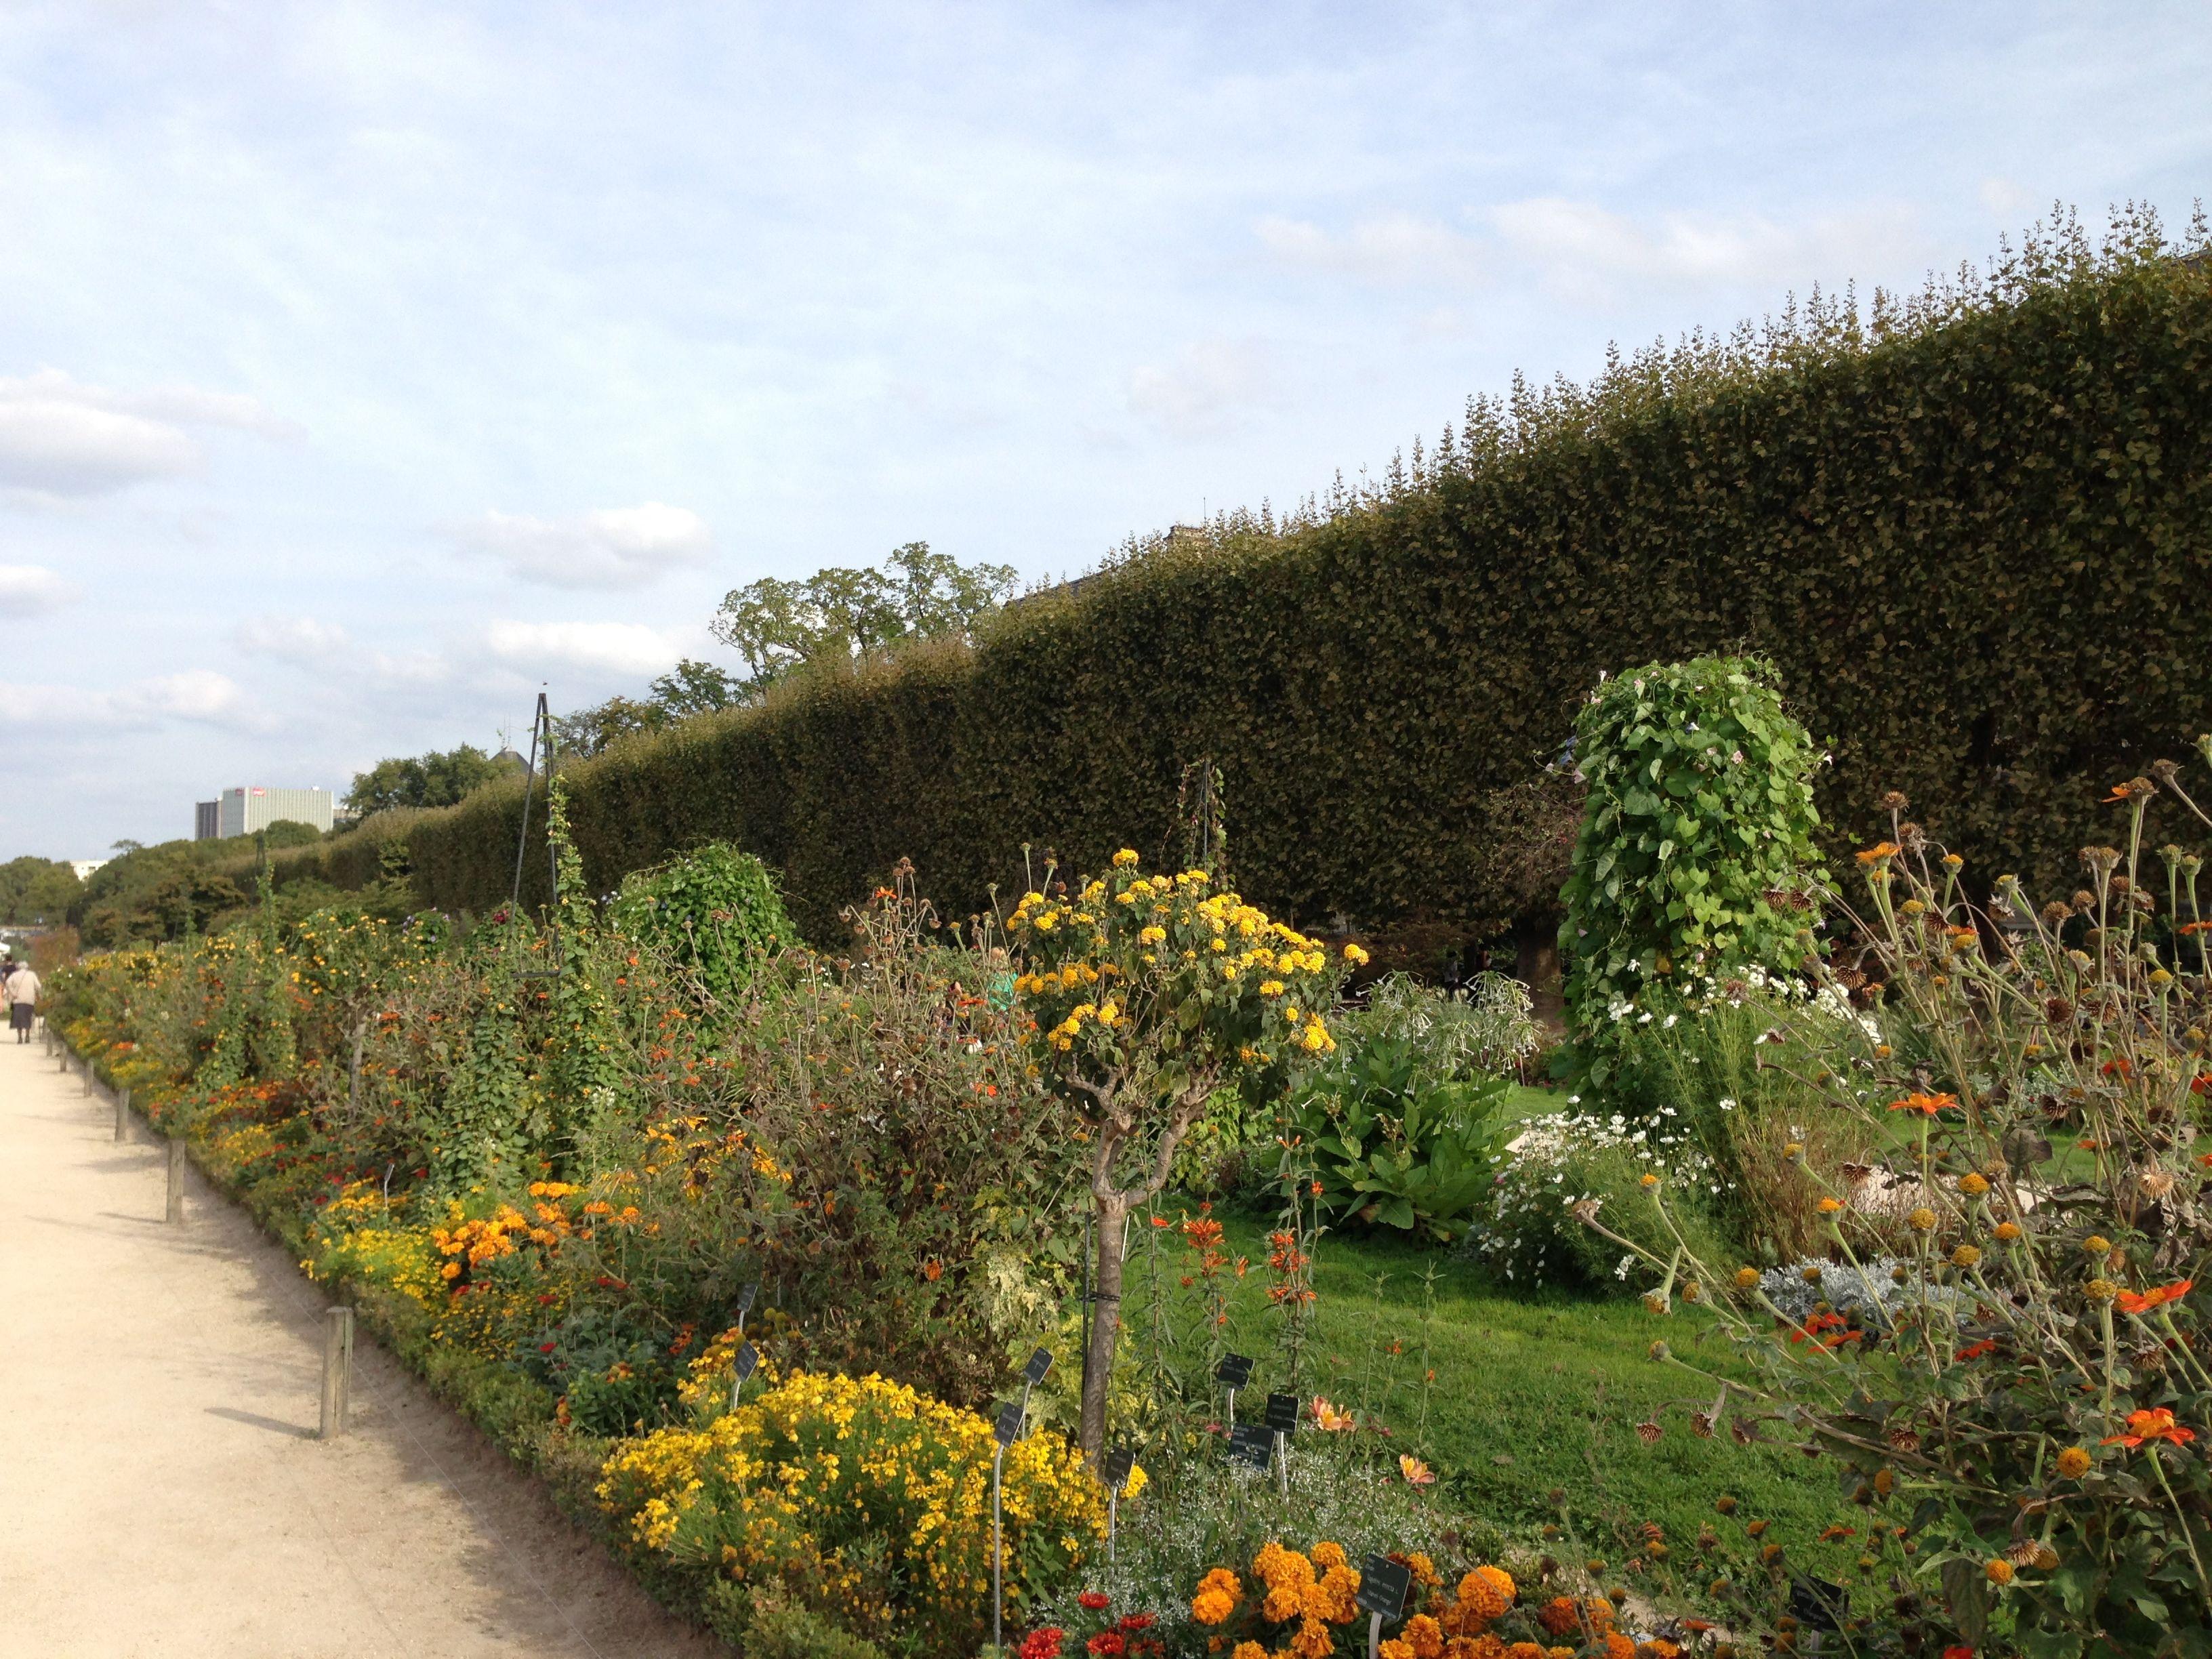 Jardin des plantes oldest botanical garden in paris for Jardin paris